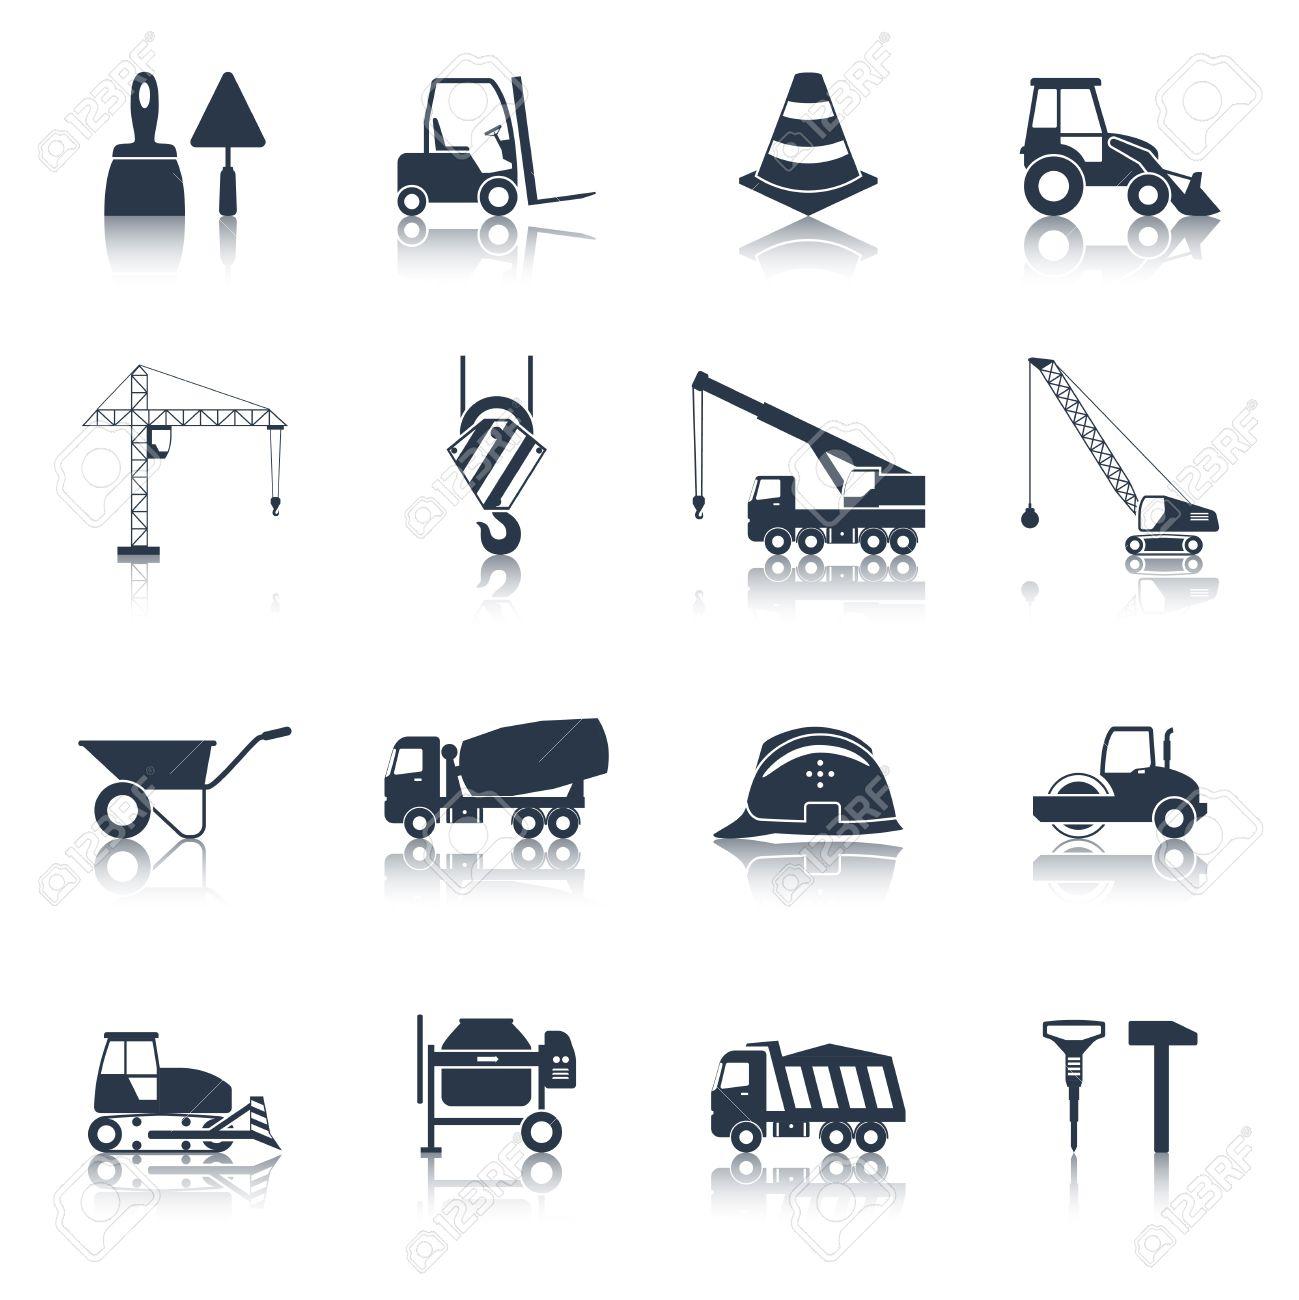 Construction Icons Black Set With Hammer Crane Helmet Drill Symbols